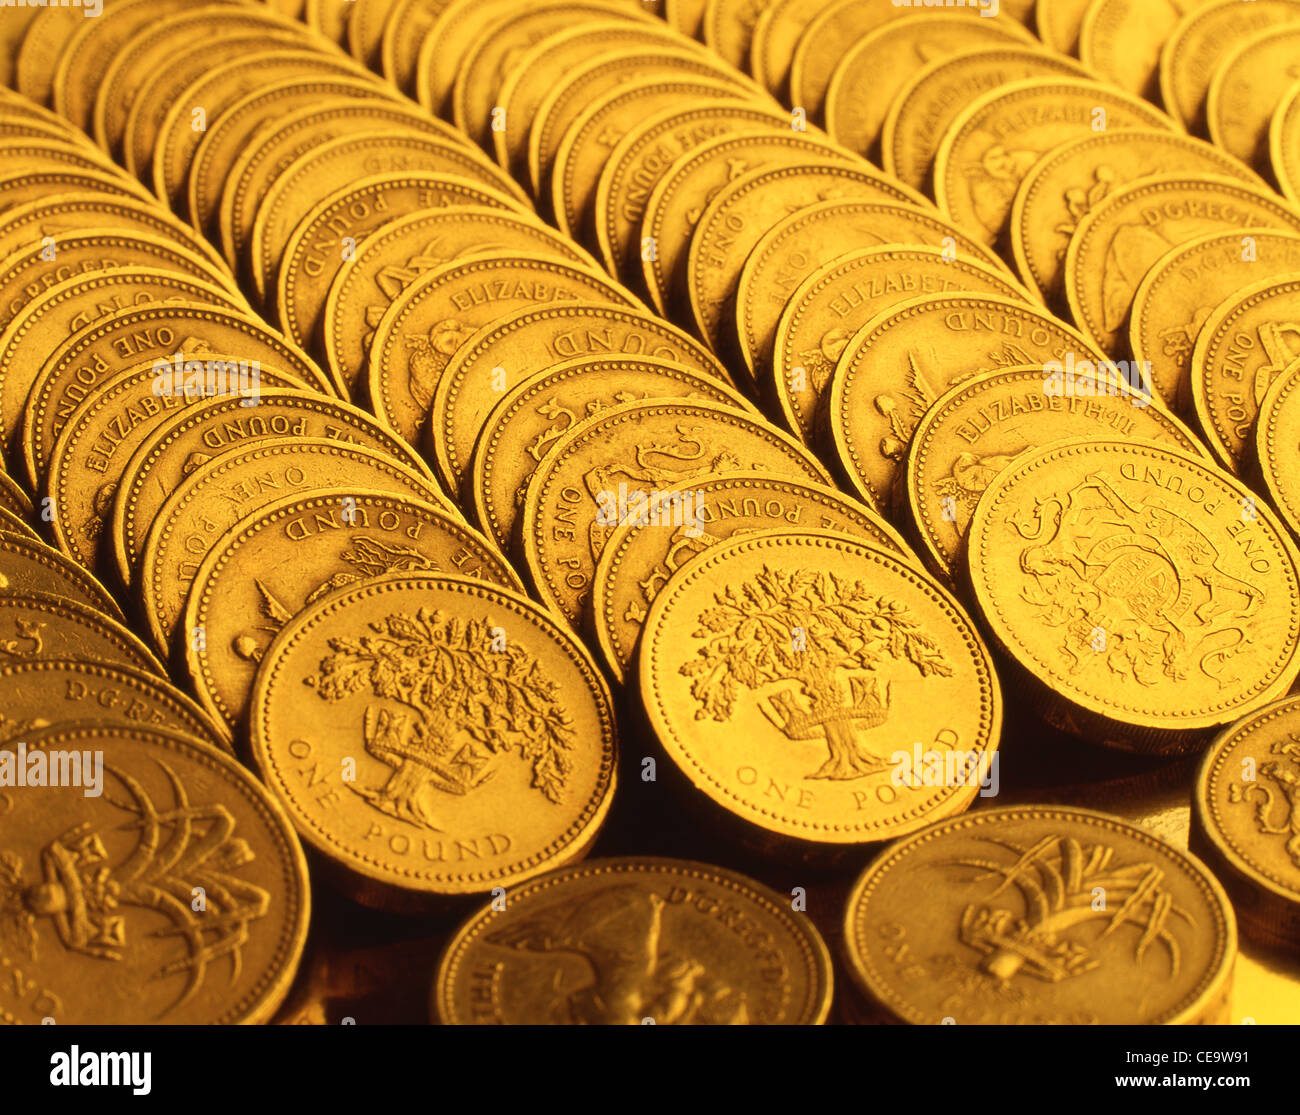 Rows of British pound coins, London, England, United Kingdom - Stock Image